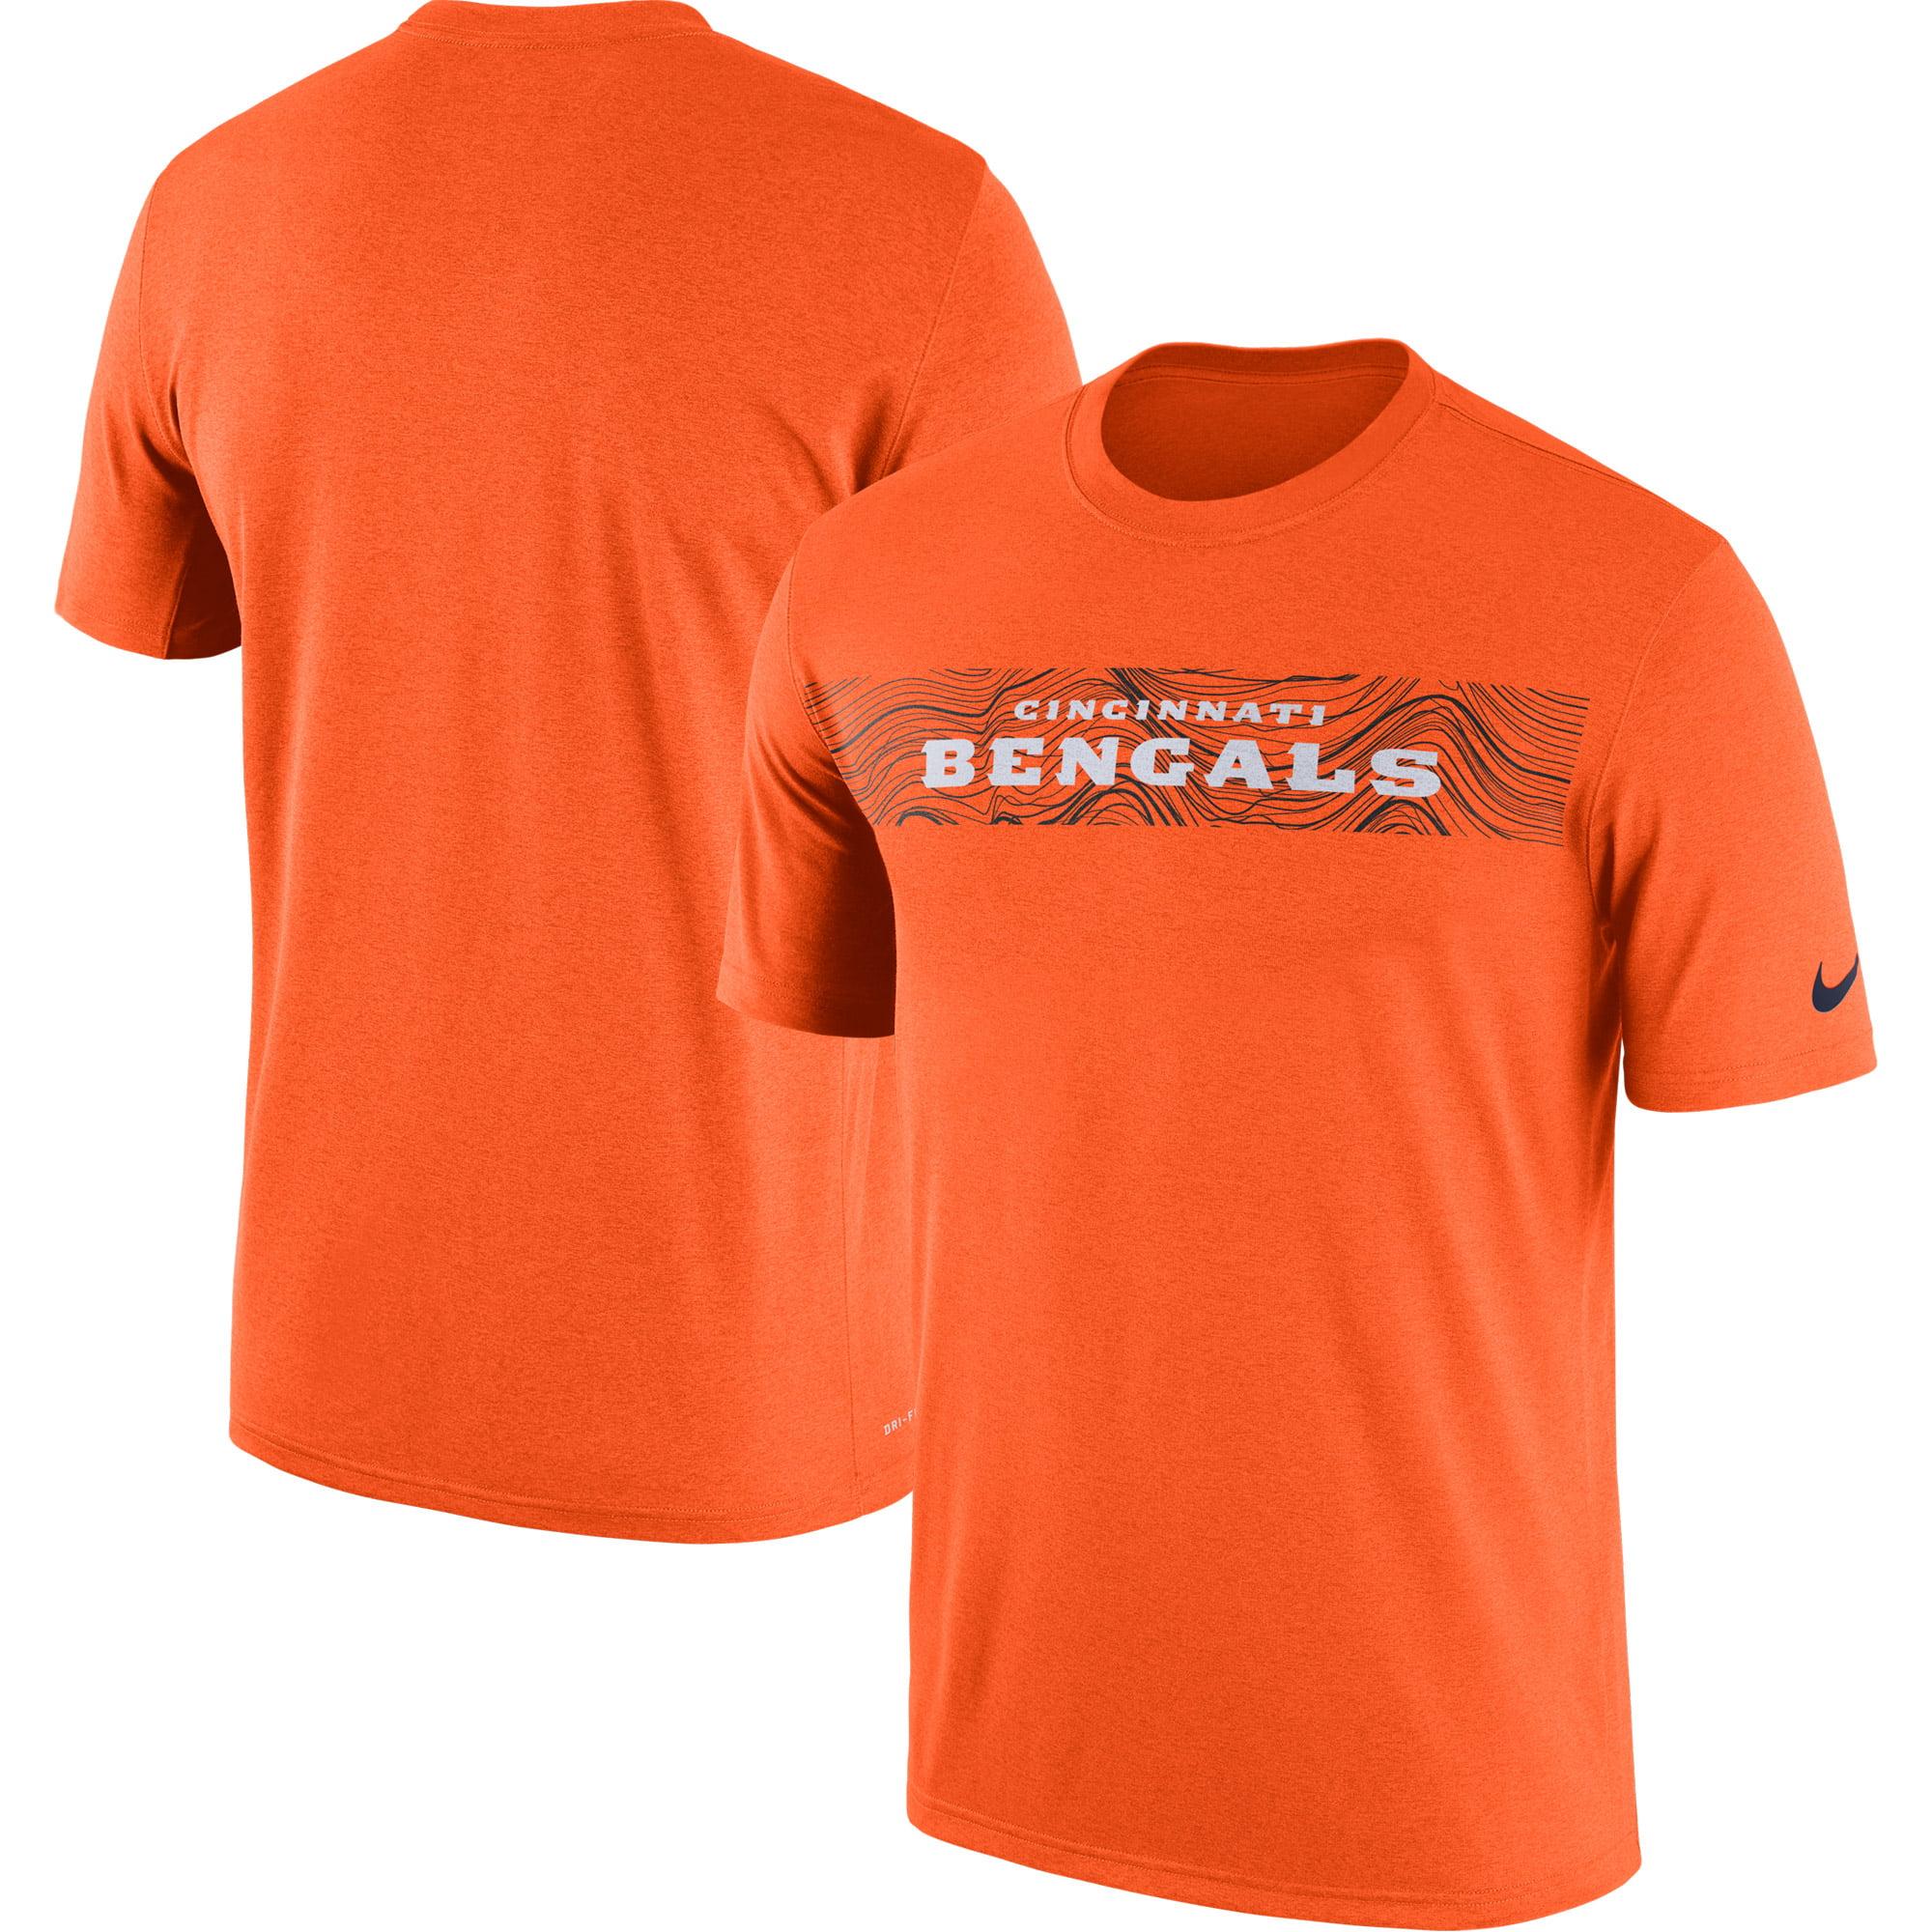 Cincinnati Bengals Nike Sideline Seismic Legend Performance T-Shirt - Orange